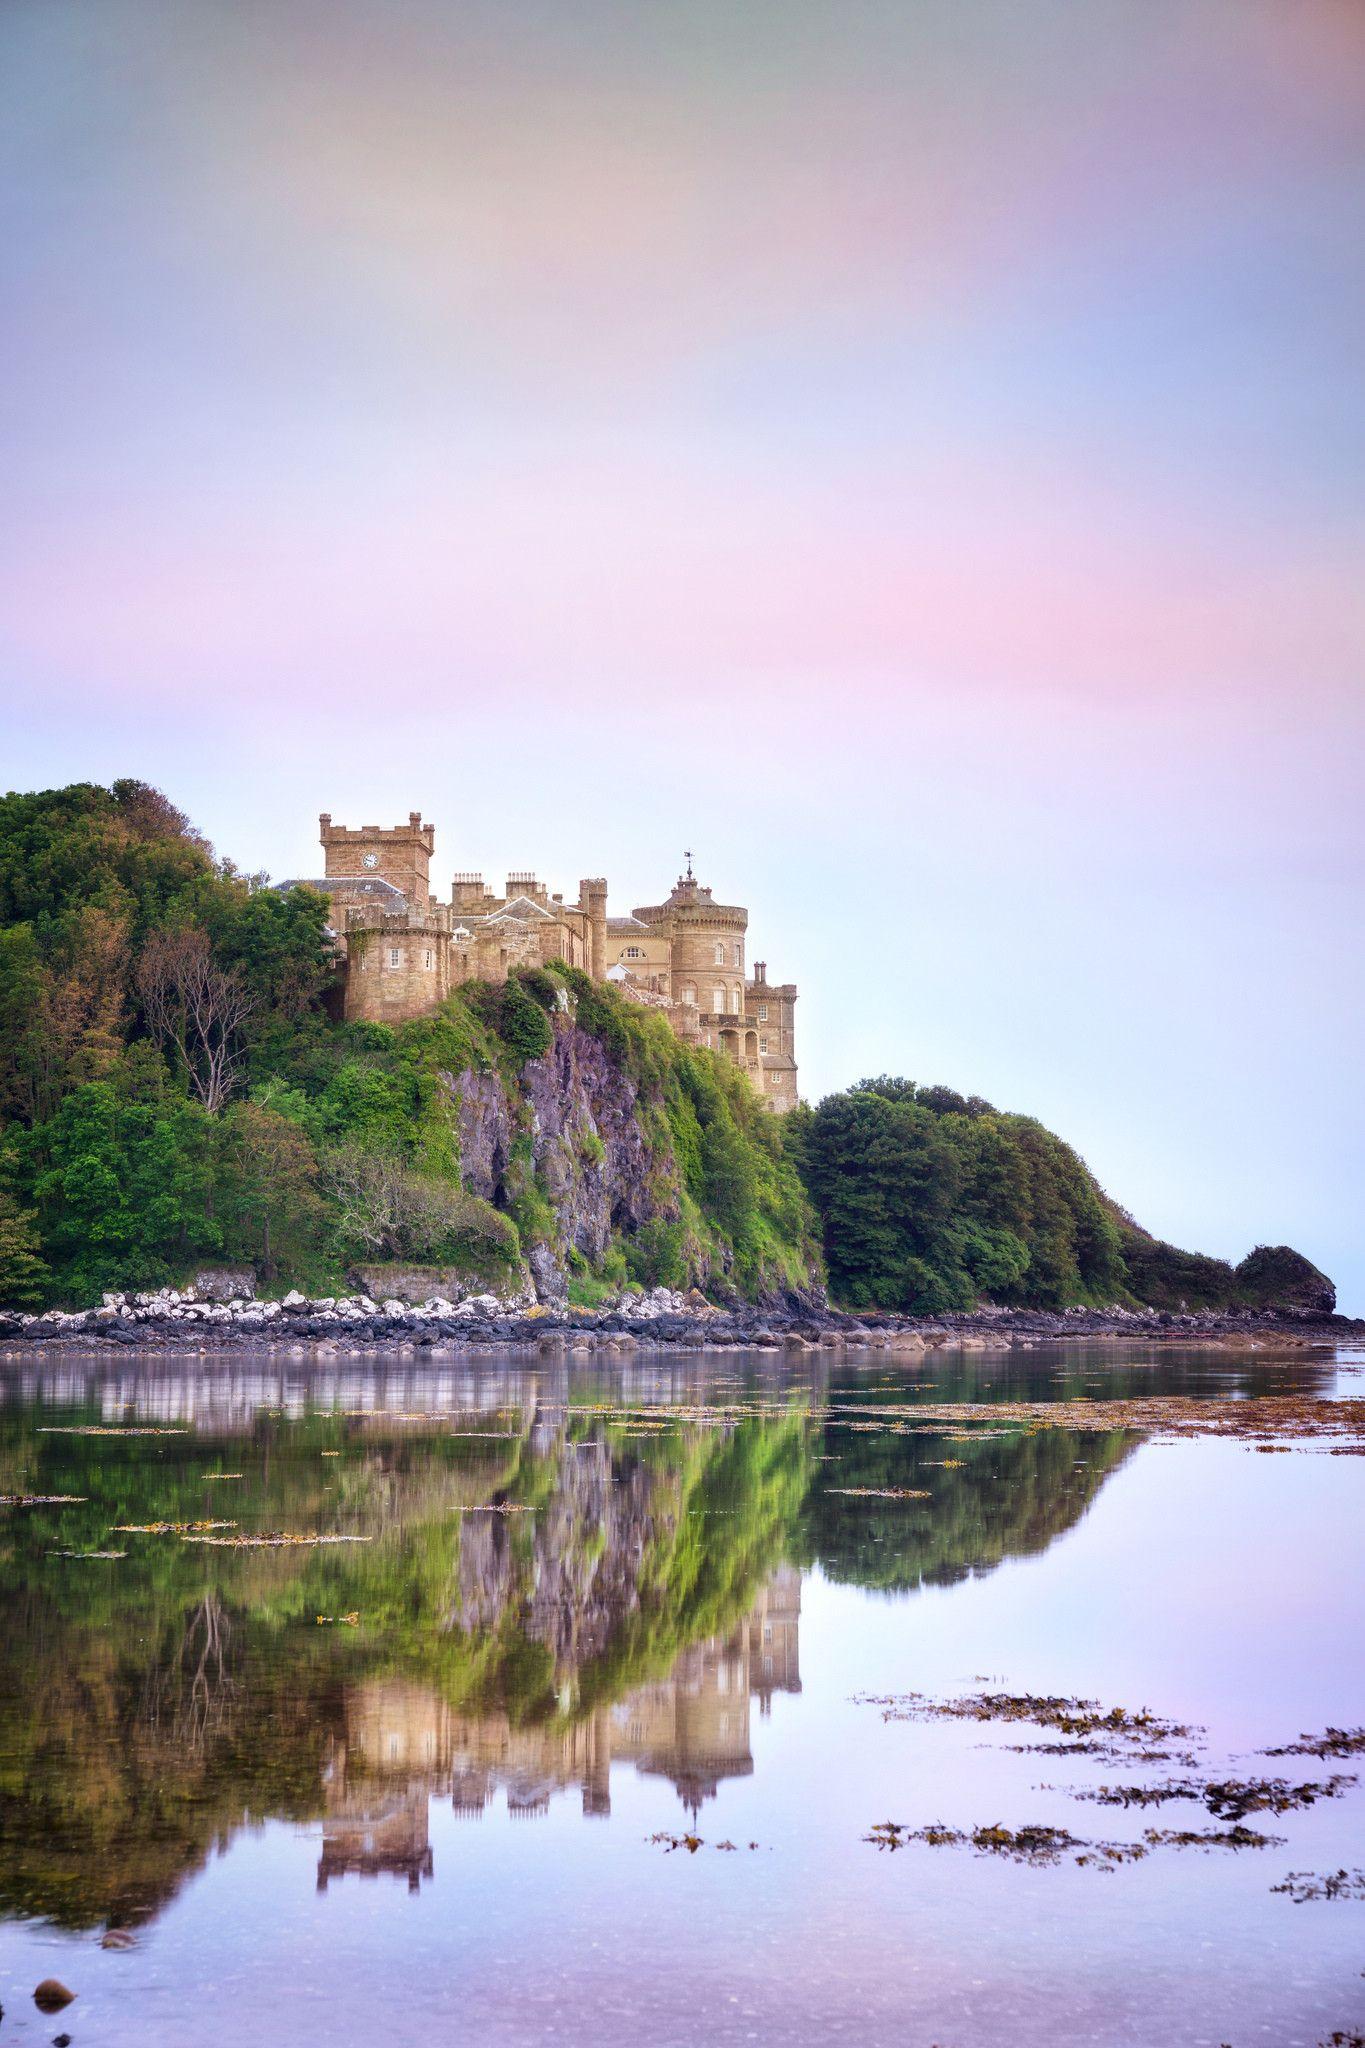 Culzean Castle, Scotland. Our tips for 25 fun things to do in Scotland: http://www.europealacarte.co.uk/blog/2010/12/30/things-scotland/